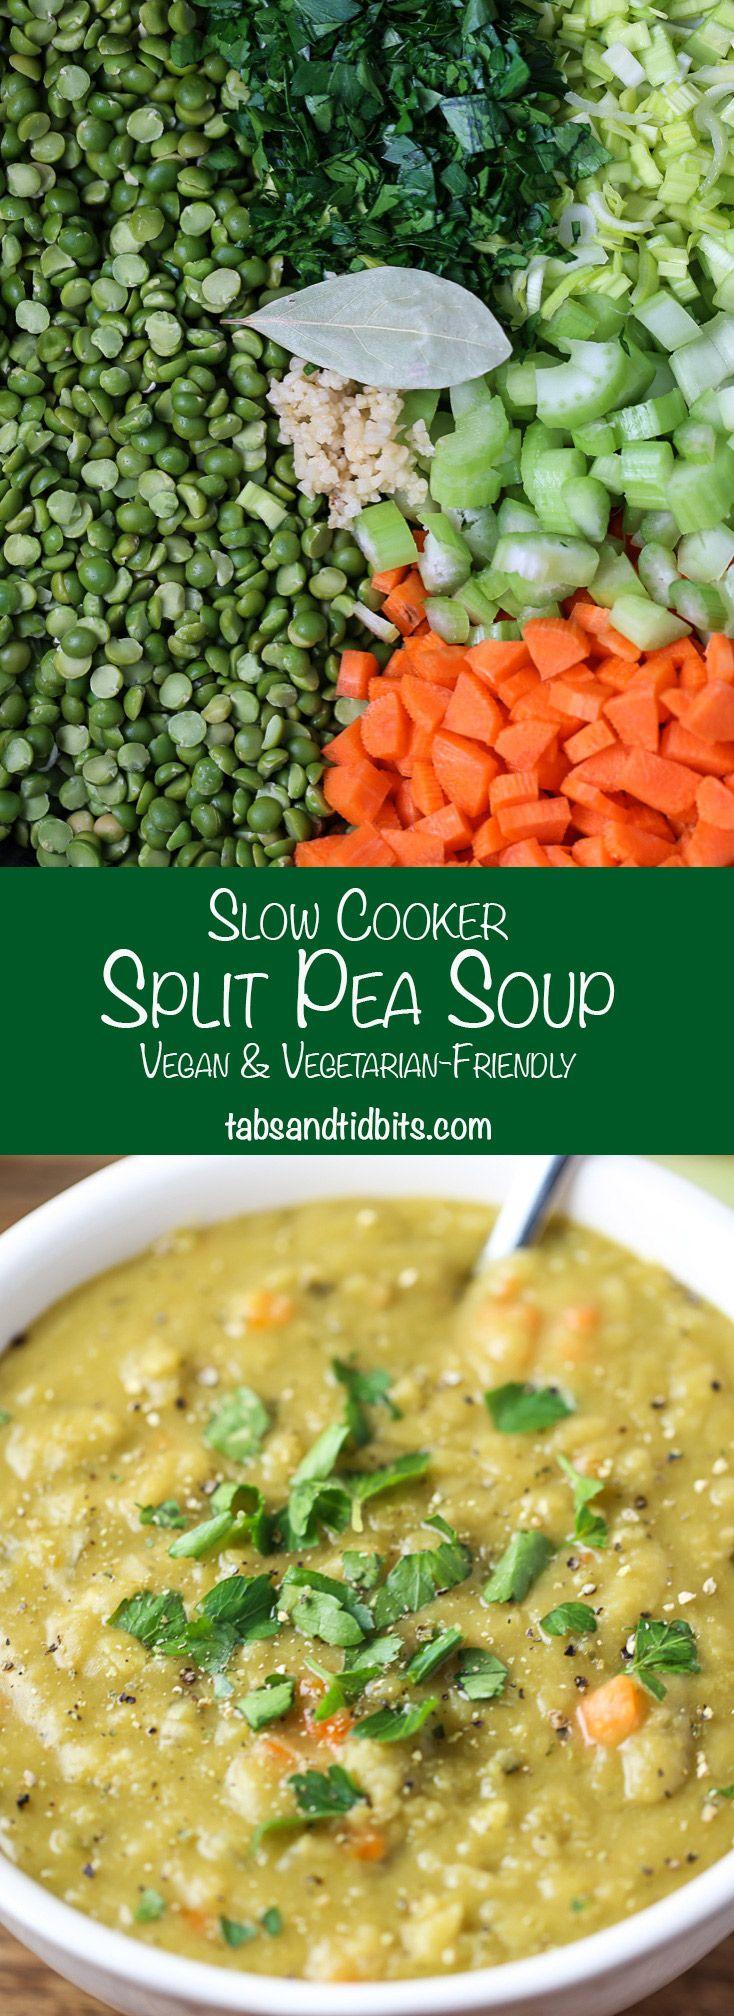 Slow Cooker Split Pea Soup A Vegan Vegetarian Friendly Split Pea Soup Made In The Slow Cooker